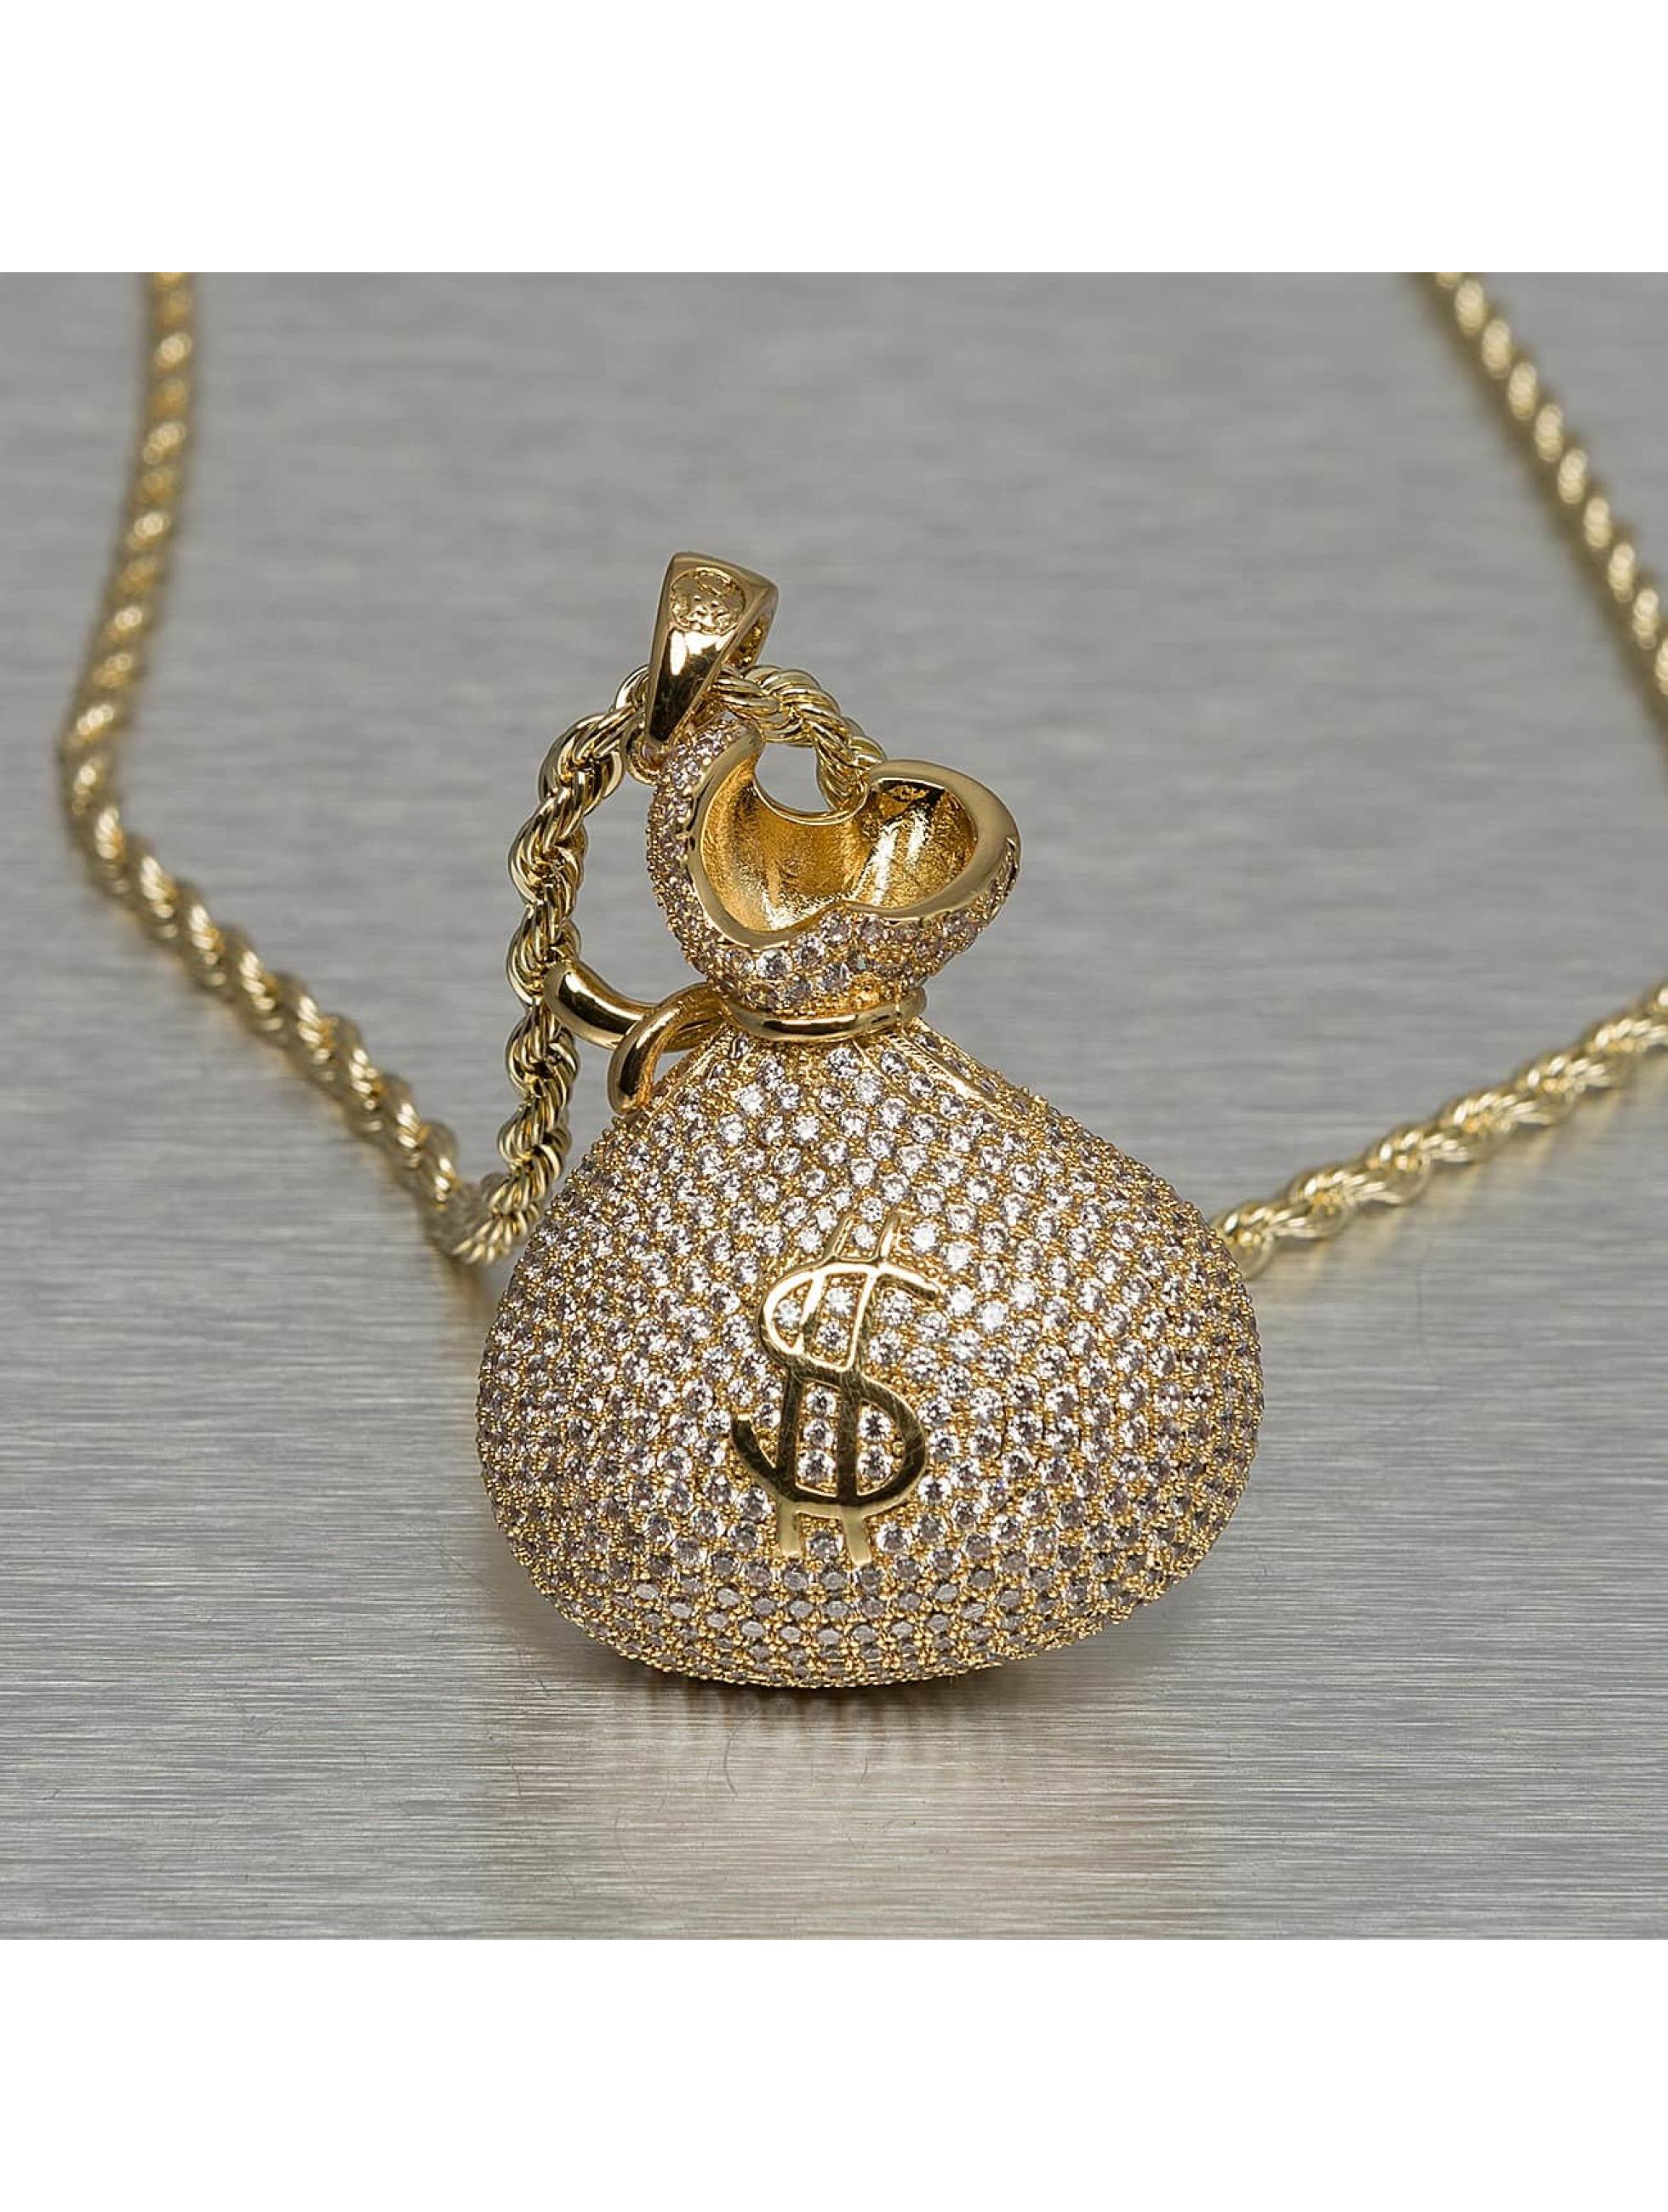 "KING ICE Kette ""Stash"" Iced-Out Money Bag goldfarben"